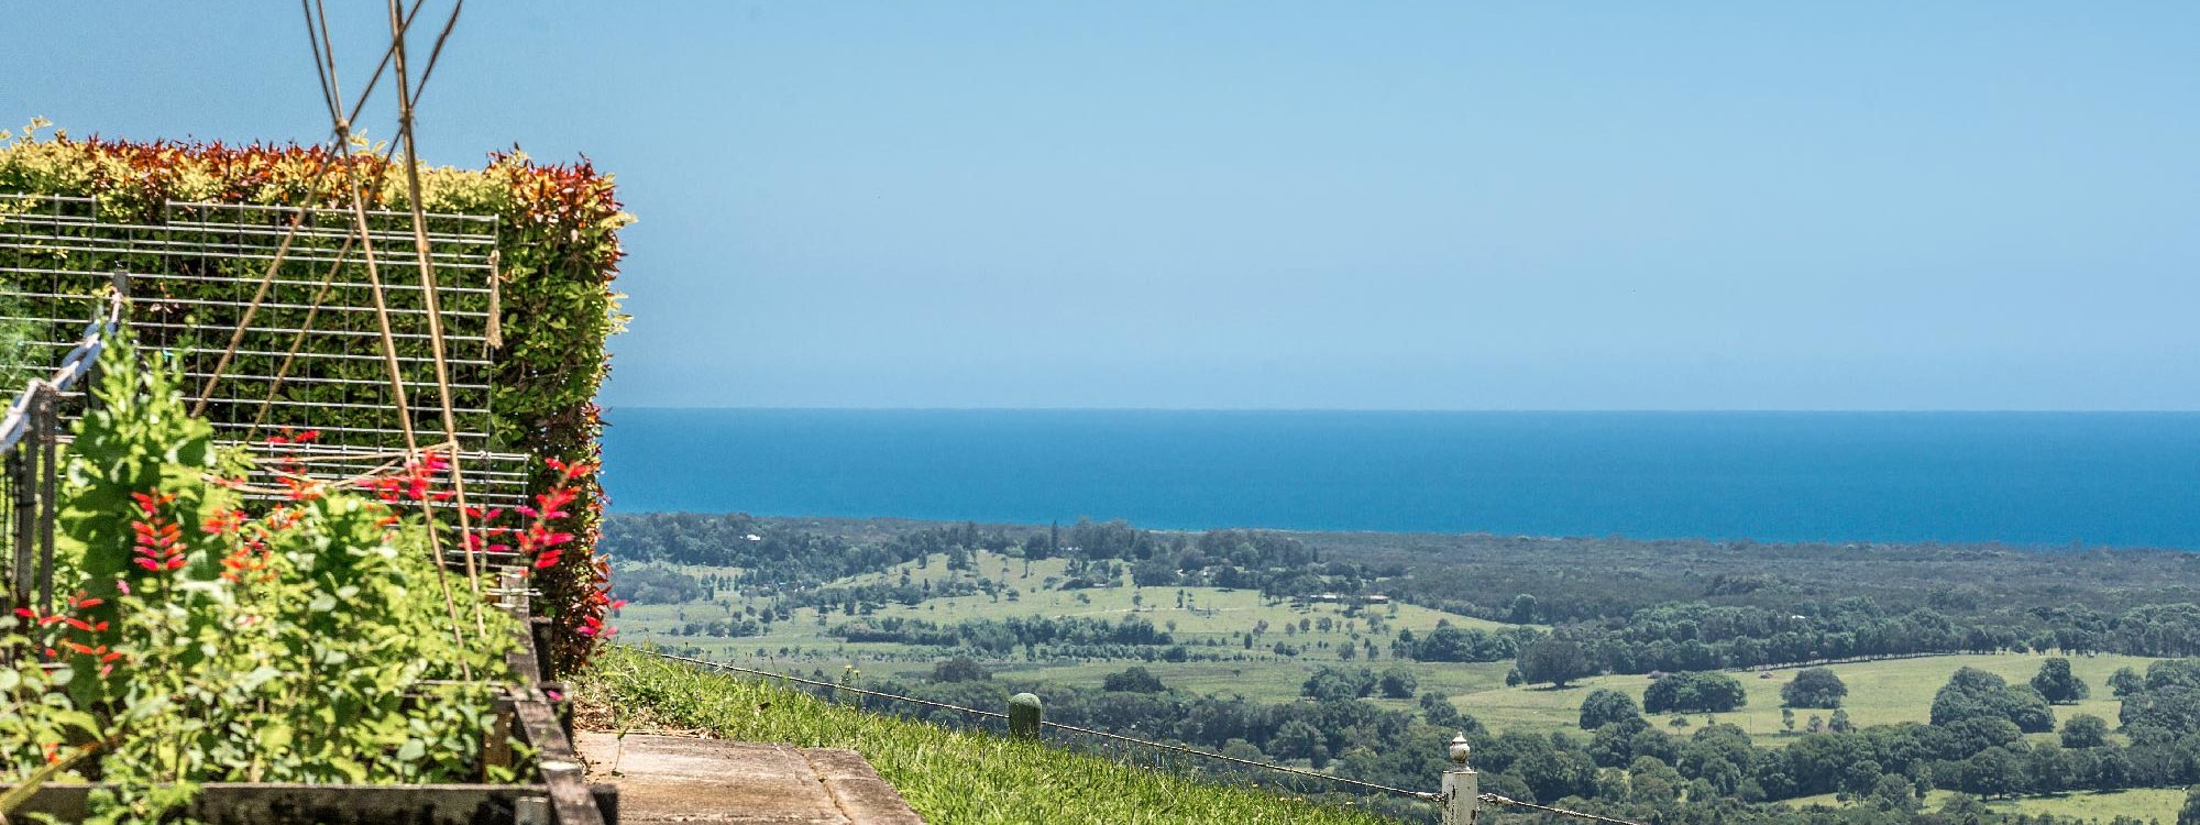 Pacific Ridge - Byron Bay - Veggie Garden with a View